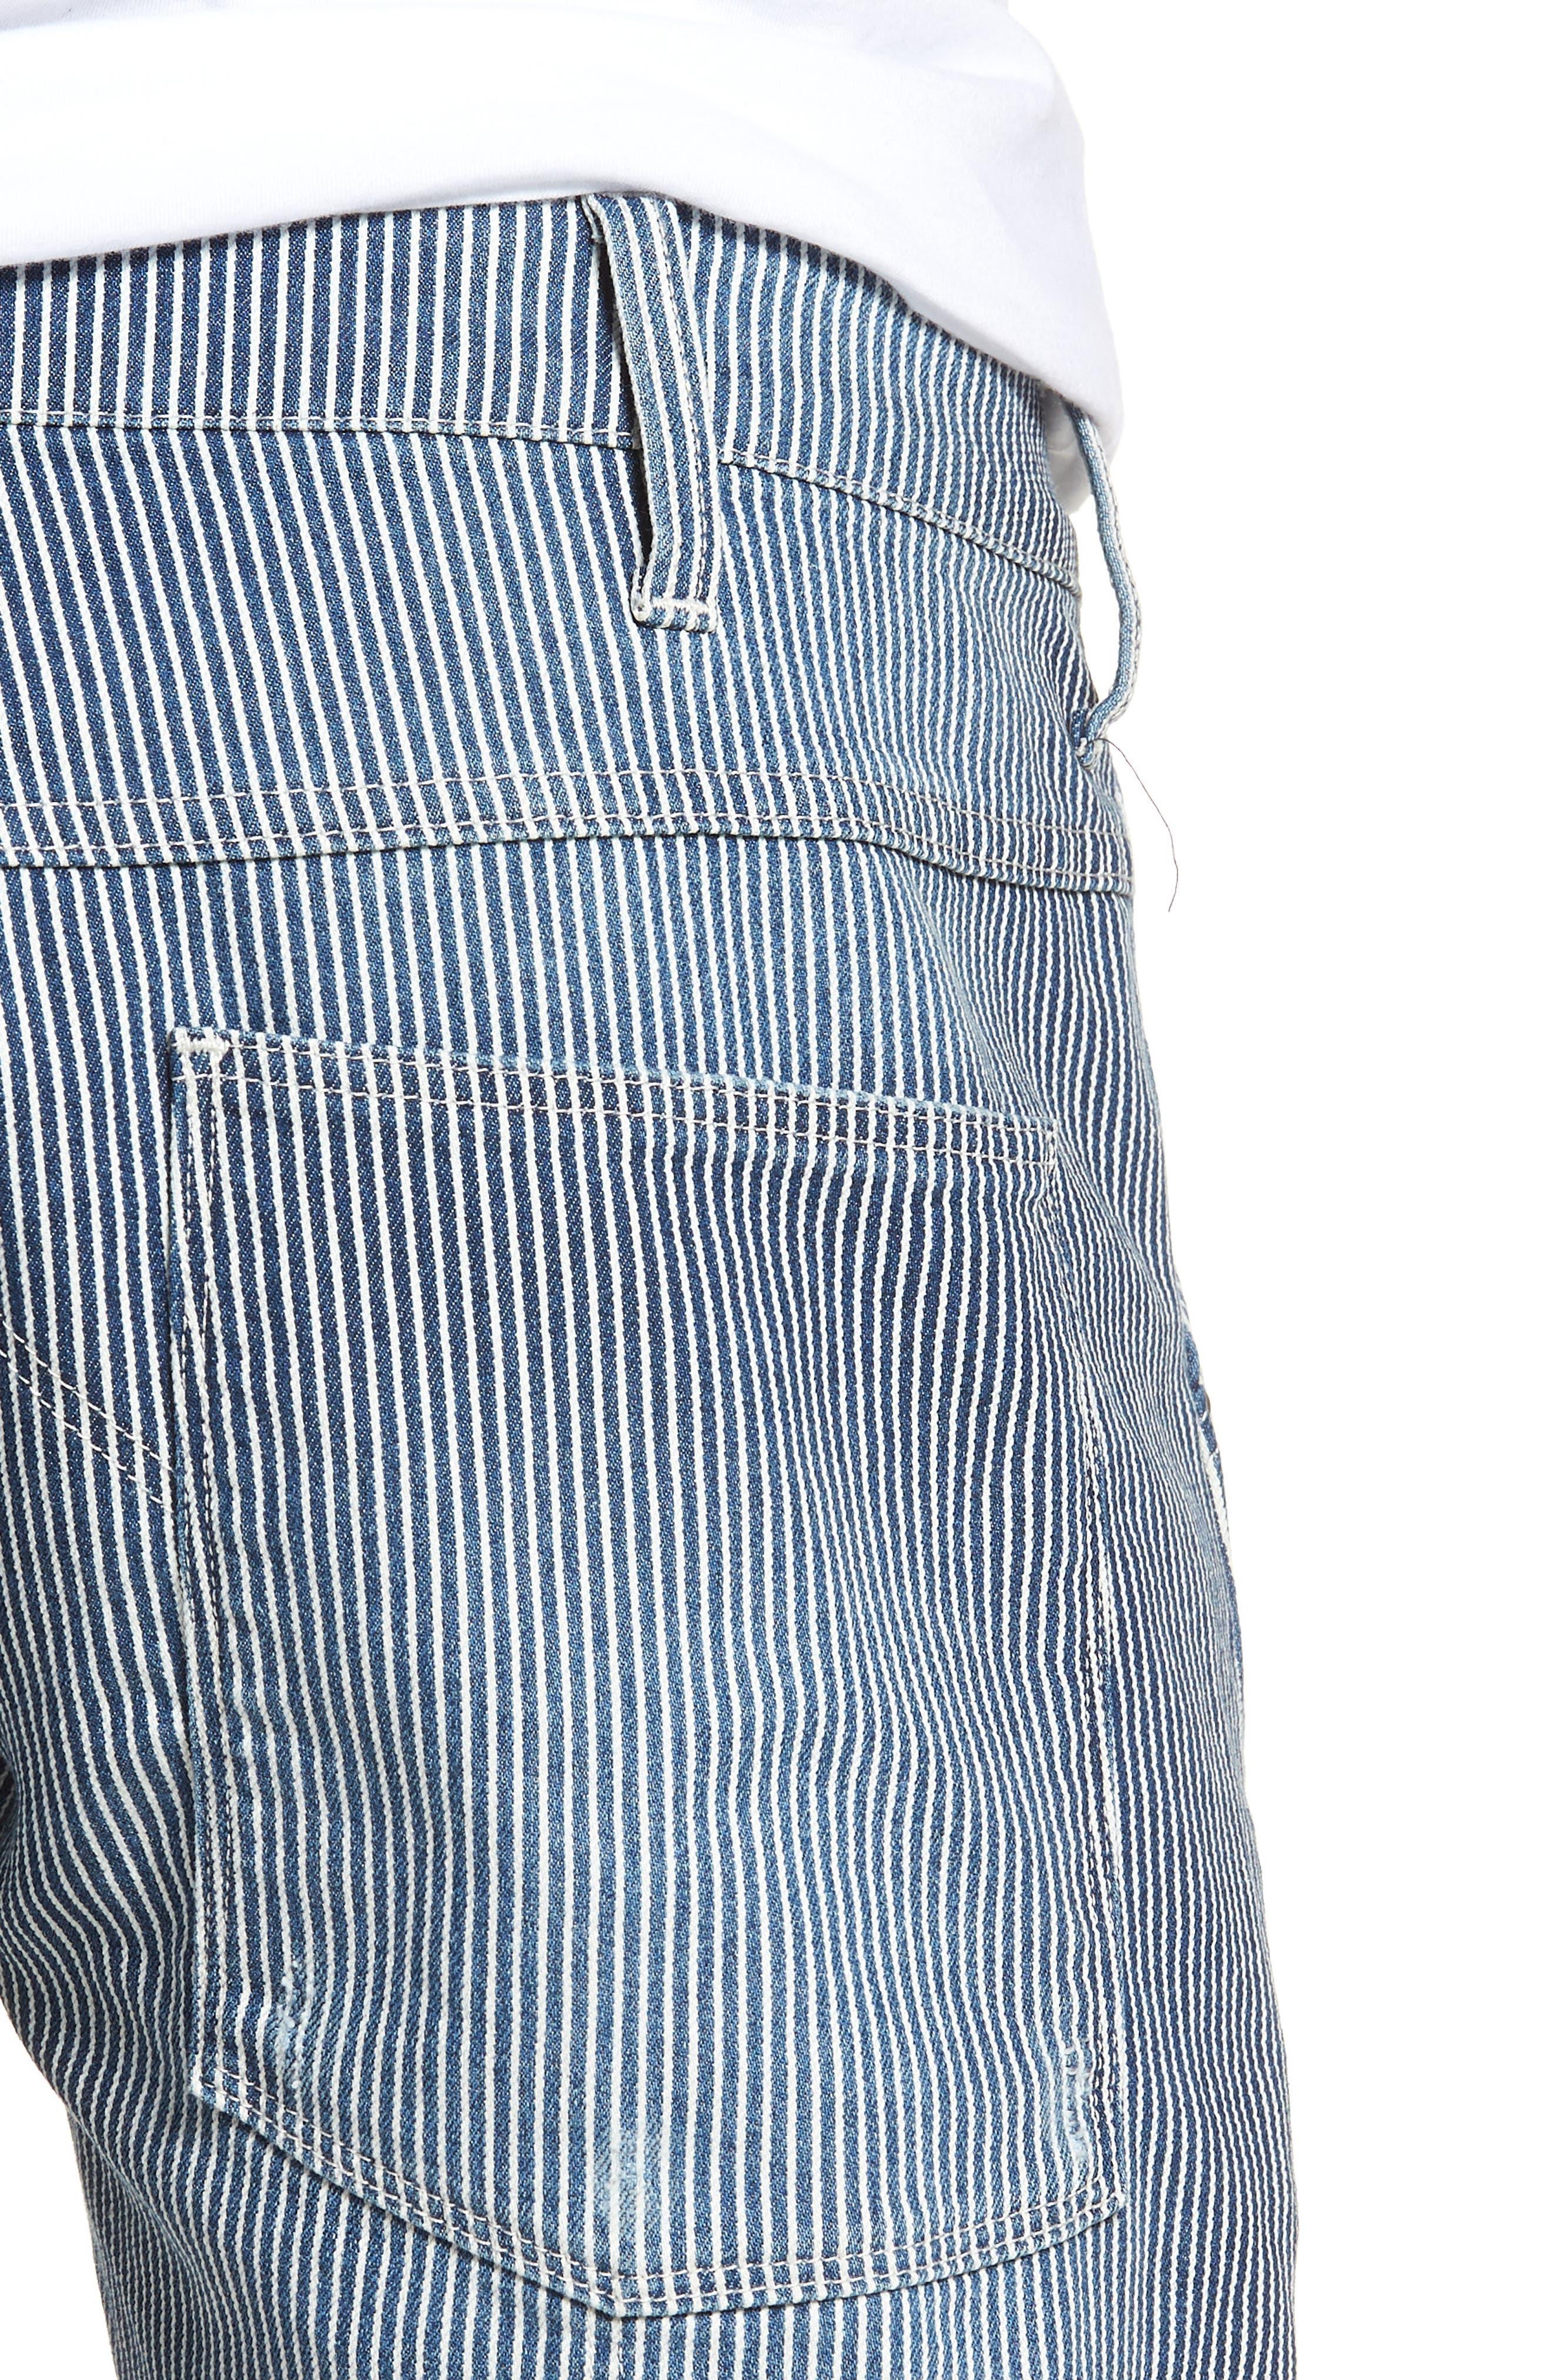 3D Slim Pants,                             Alternate thumbnail 4, color,                             Medium Aged Destroy